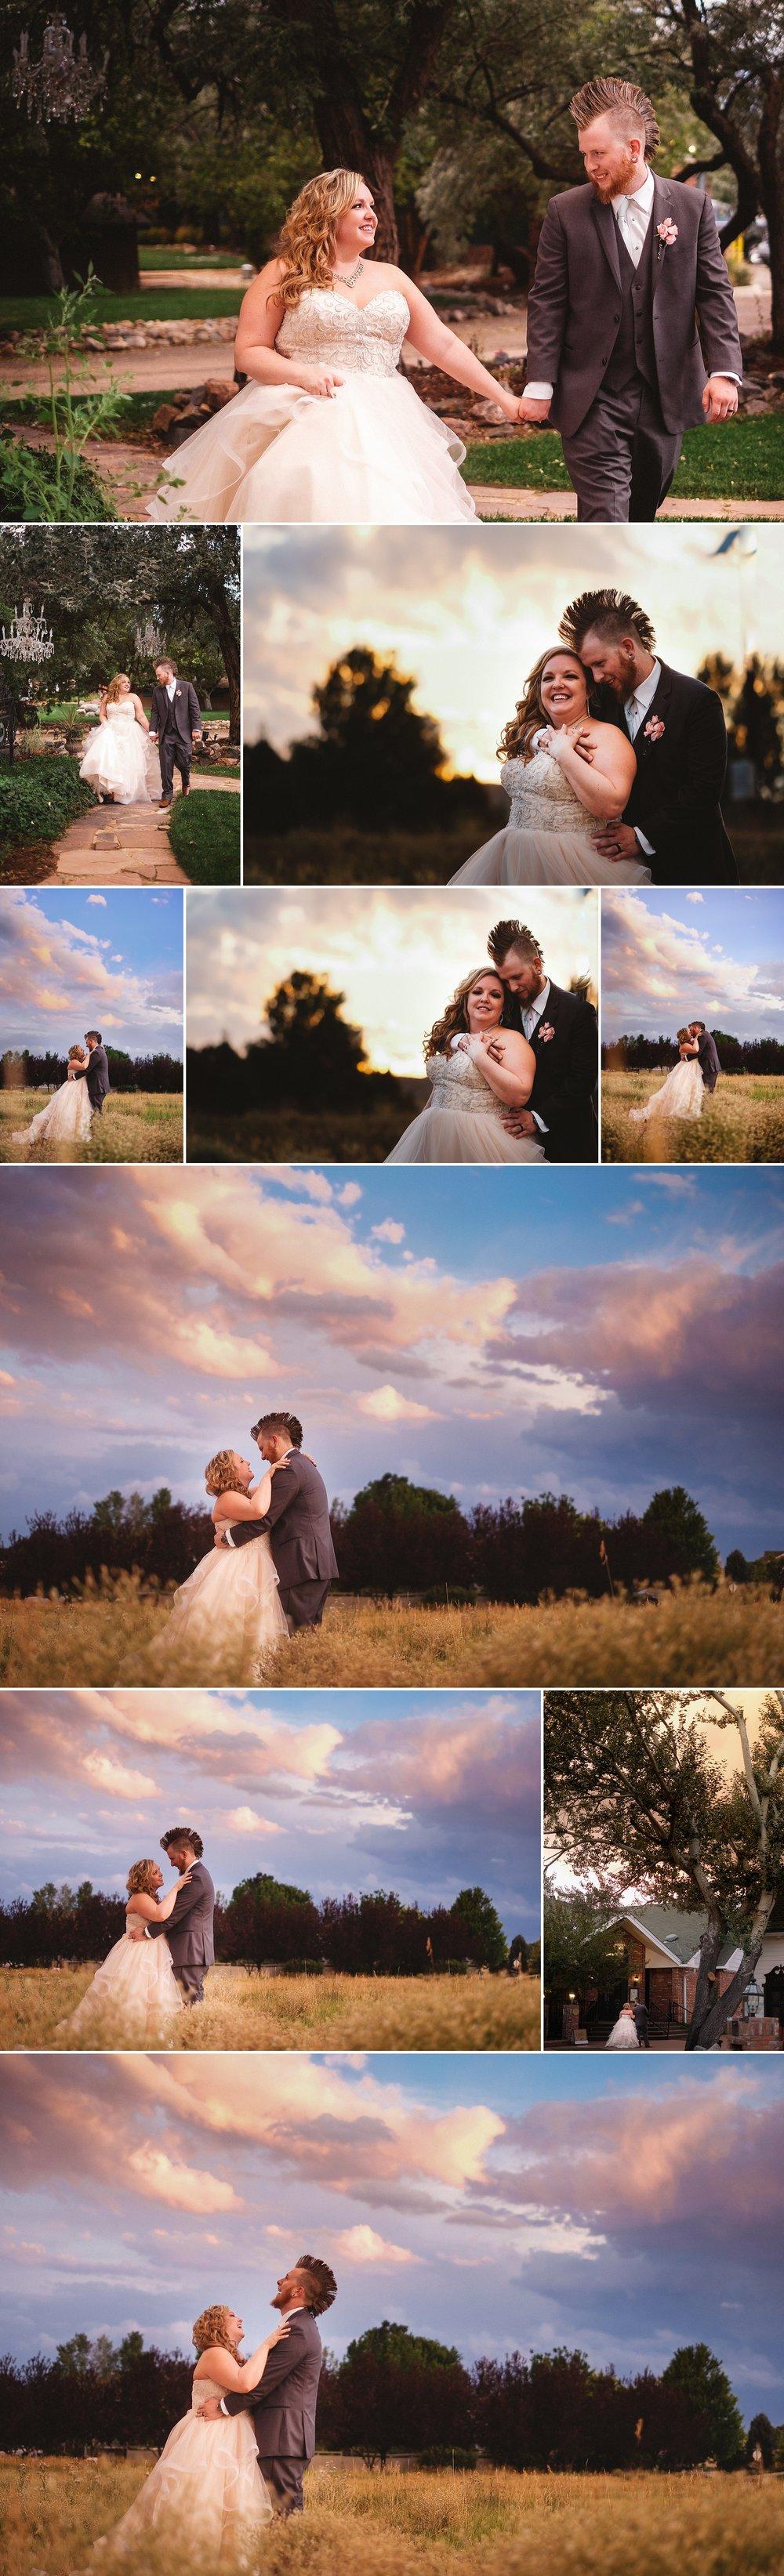 Mallory+Jake-Lionsgate-Event-Center-Wedding-Gatehouse-011_WEB.jpg